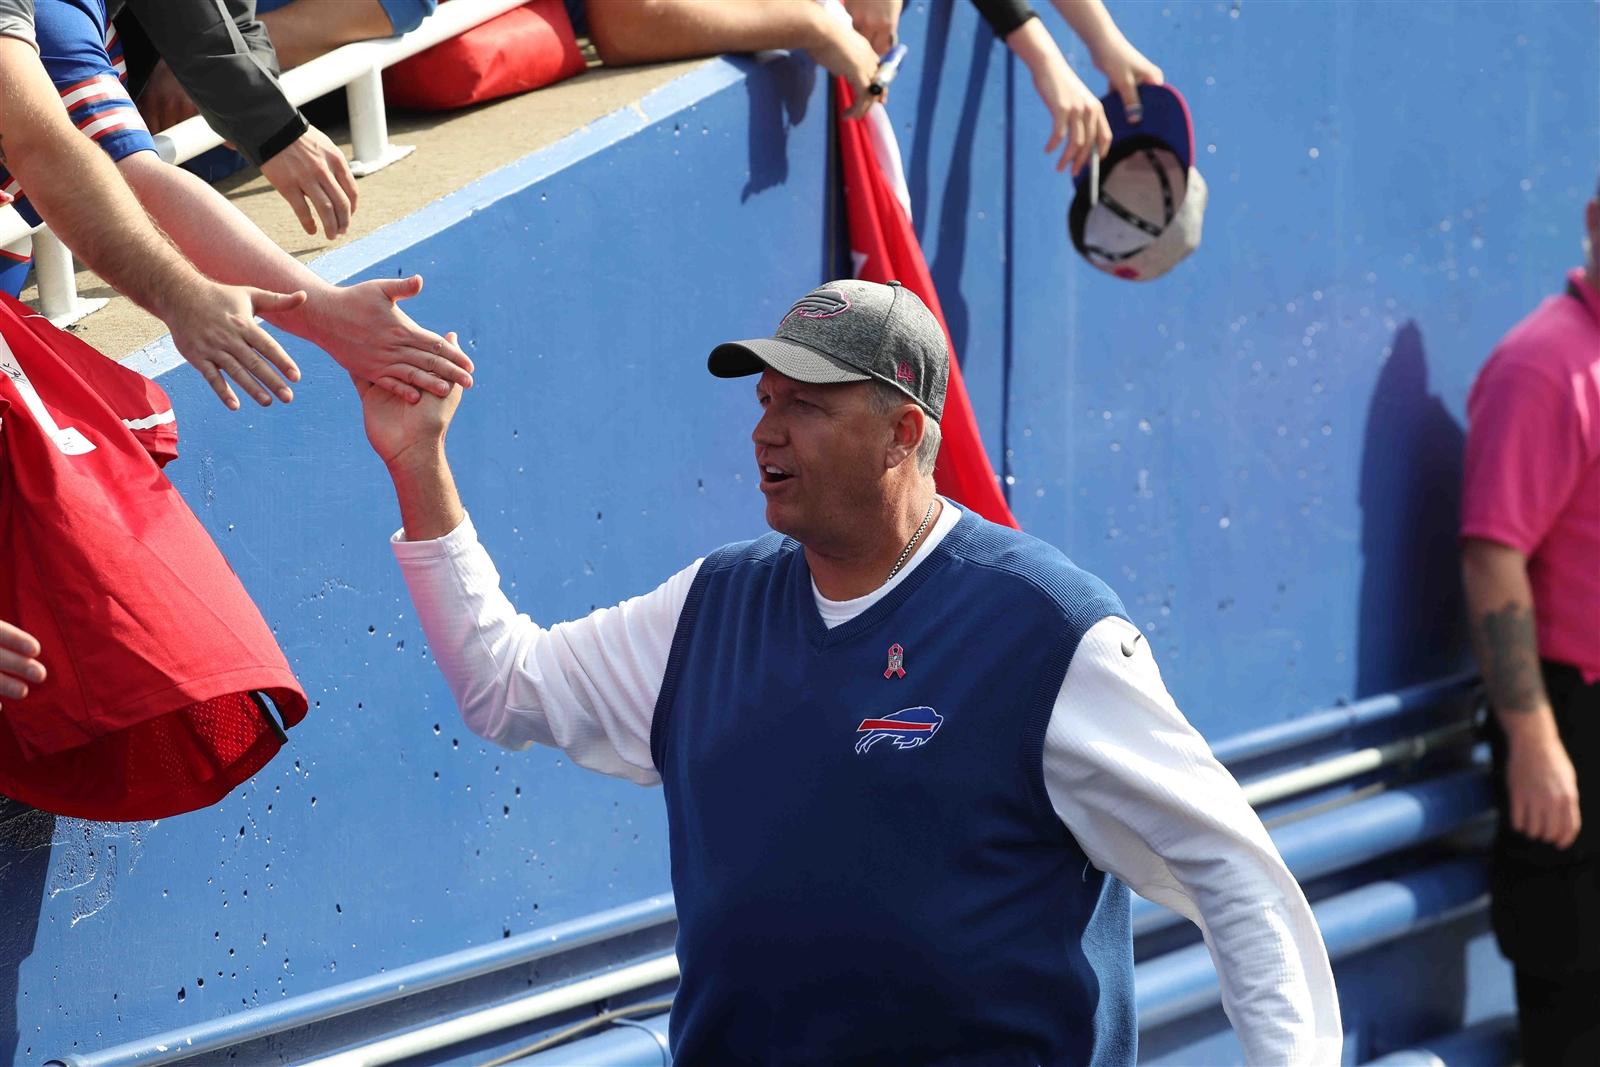 Rex Ryan greets Bills fans as he enters the field to face San Francisco. (James P. McCoy/Buffalo News)